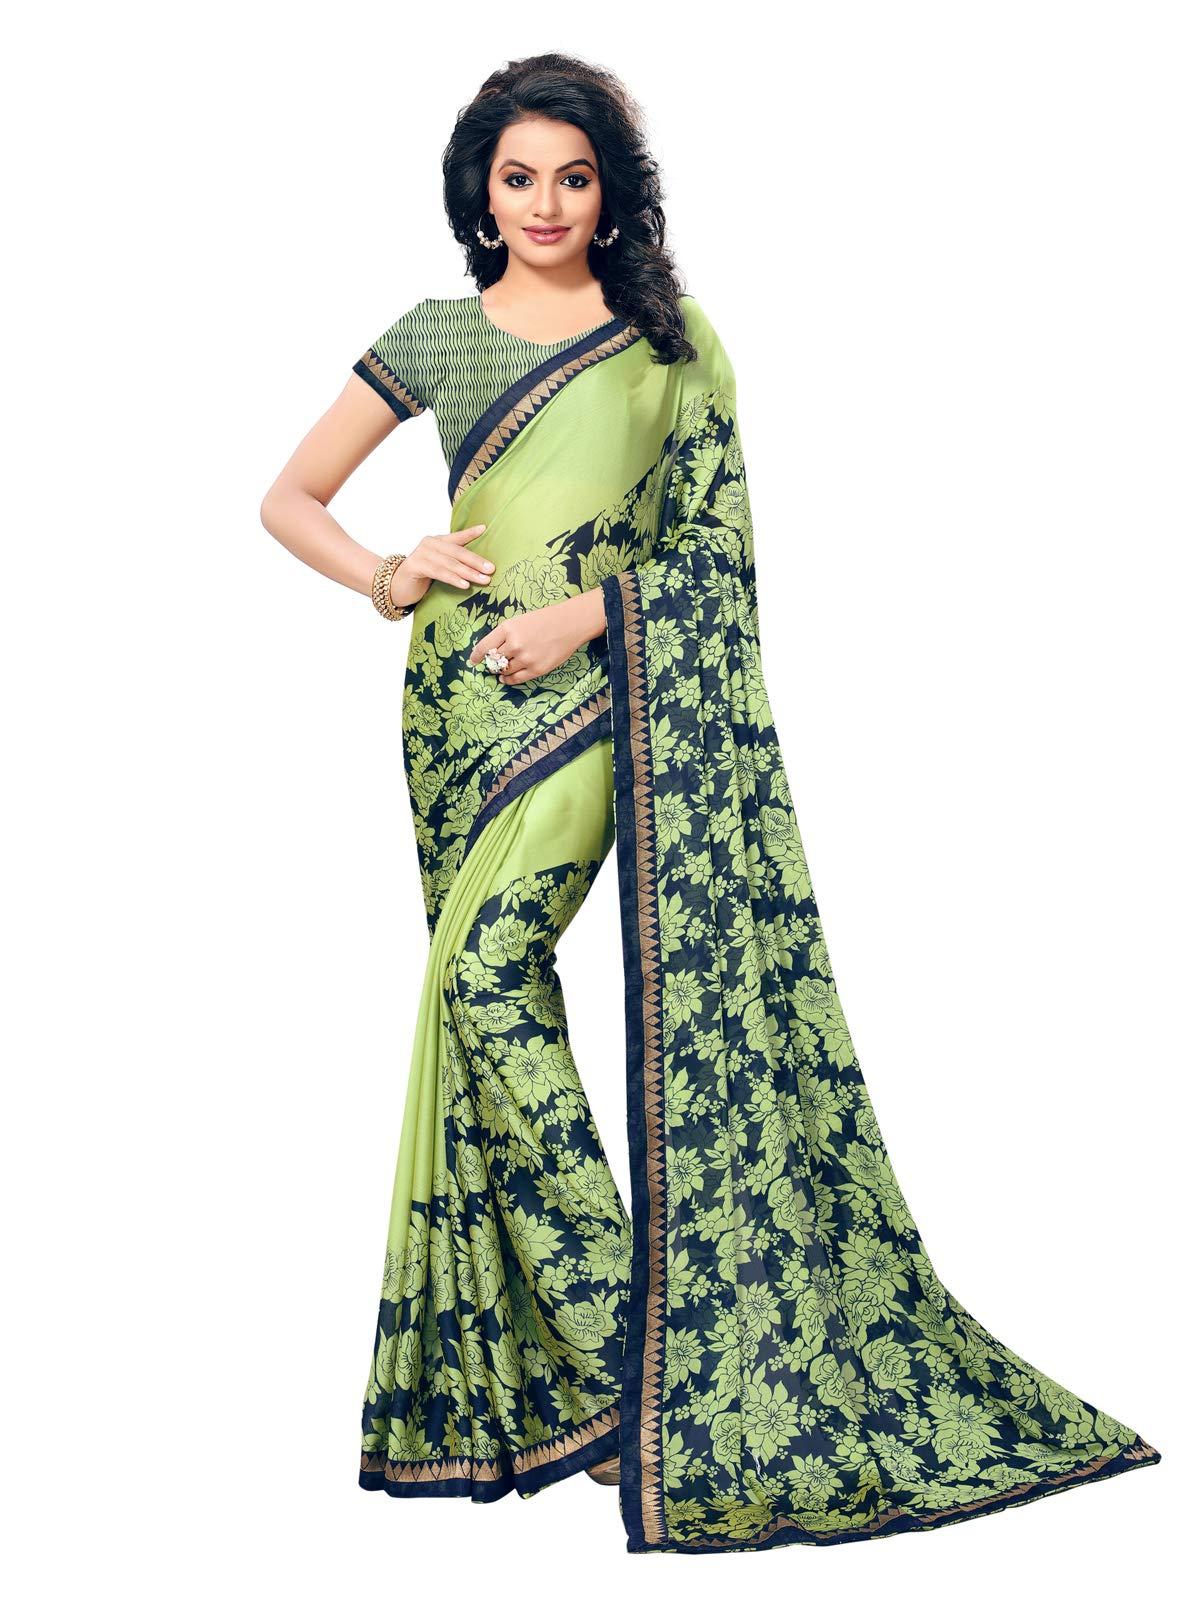 Kanchnar Women's Green Chiffon Georgette Printed Saree677S5